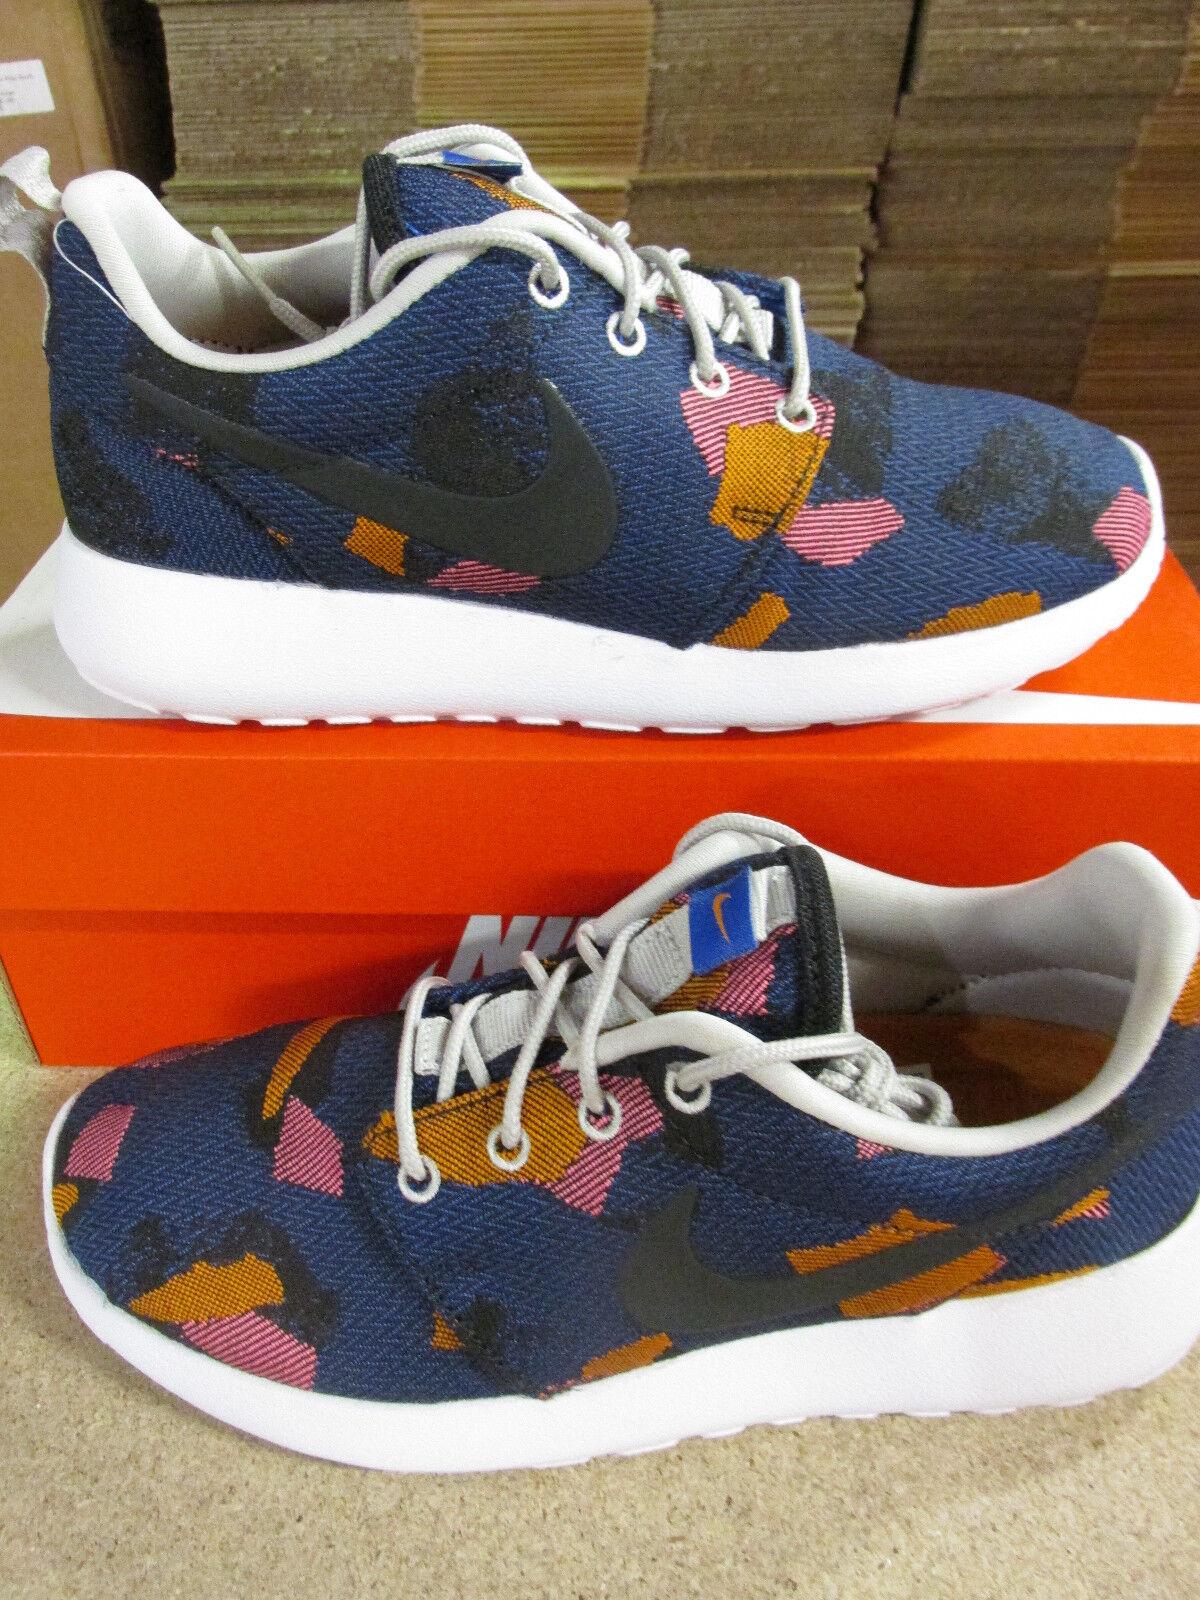 Nike femme roshe one jcrd print running baskets 845009 400 baskets chaussures